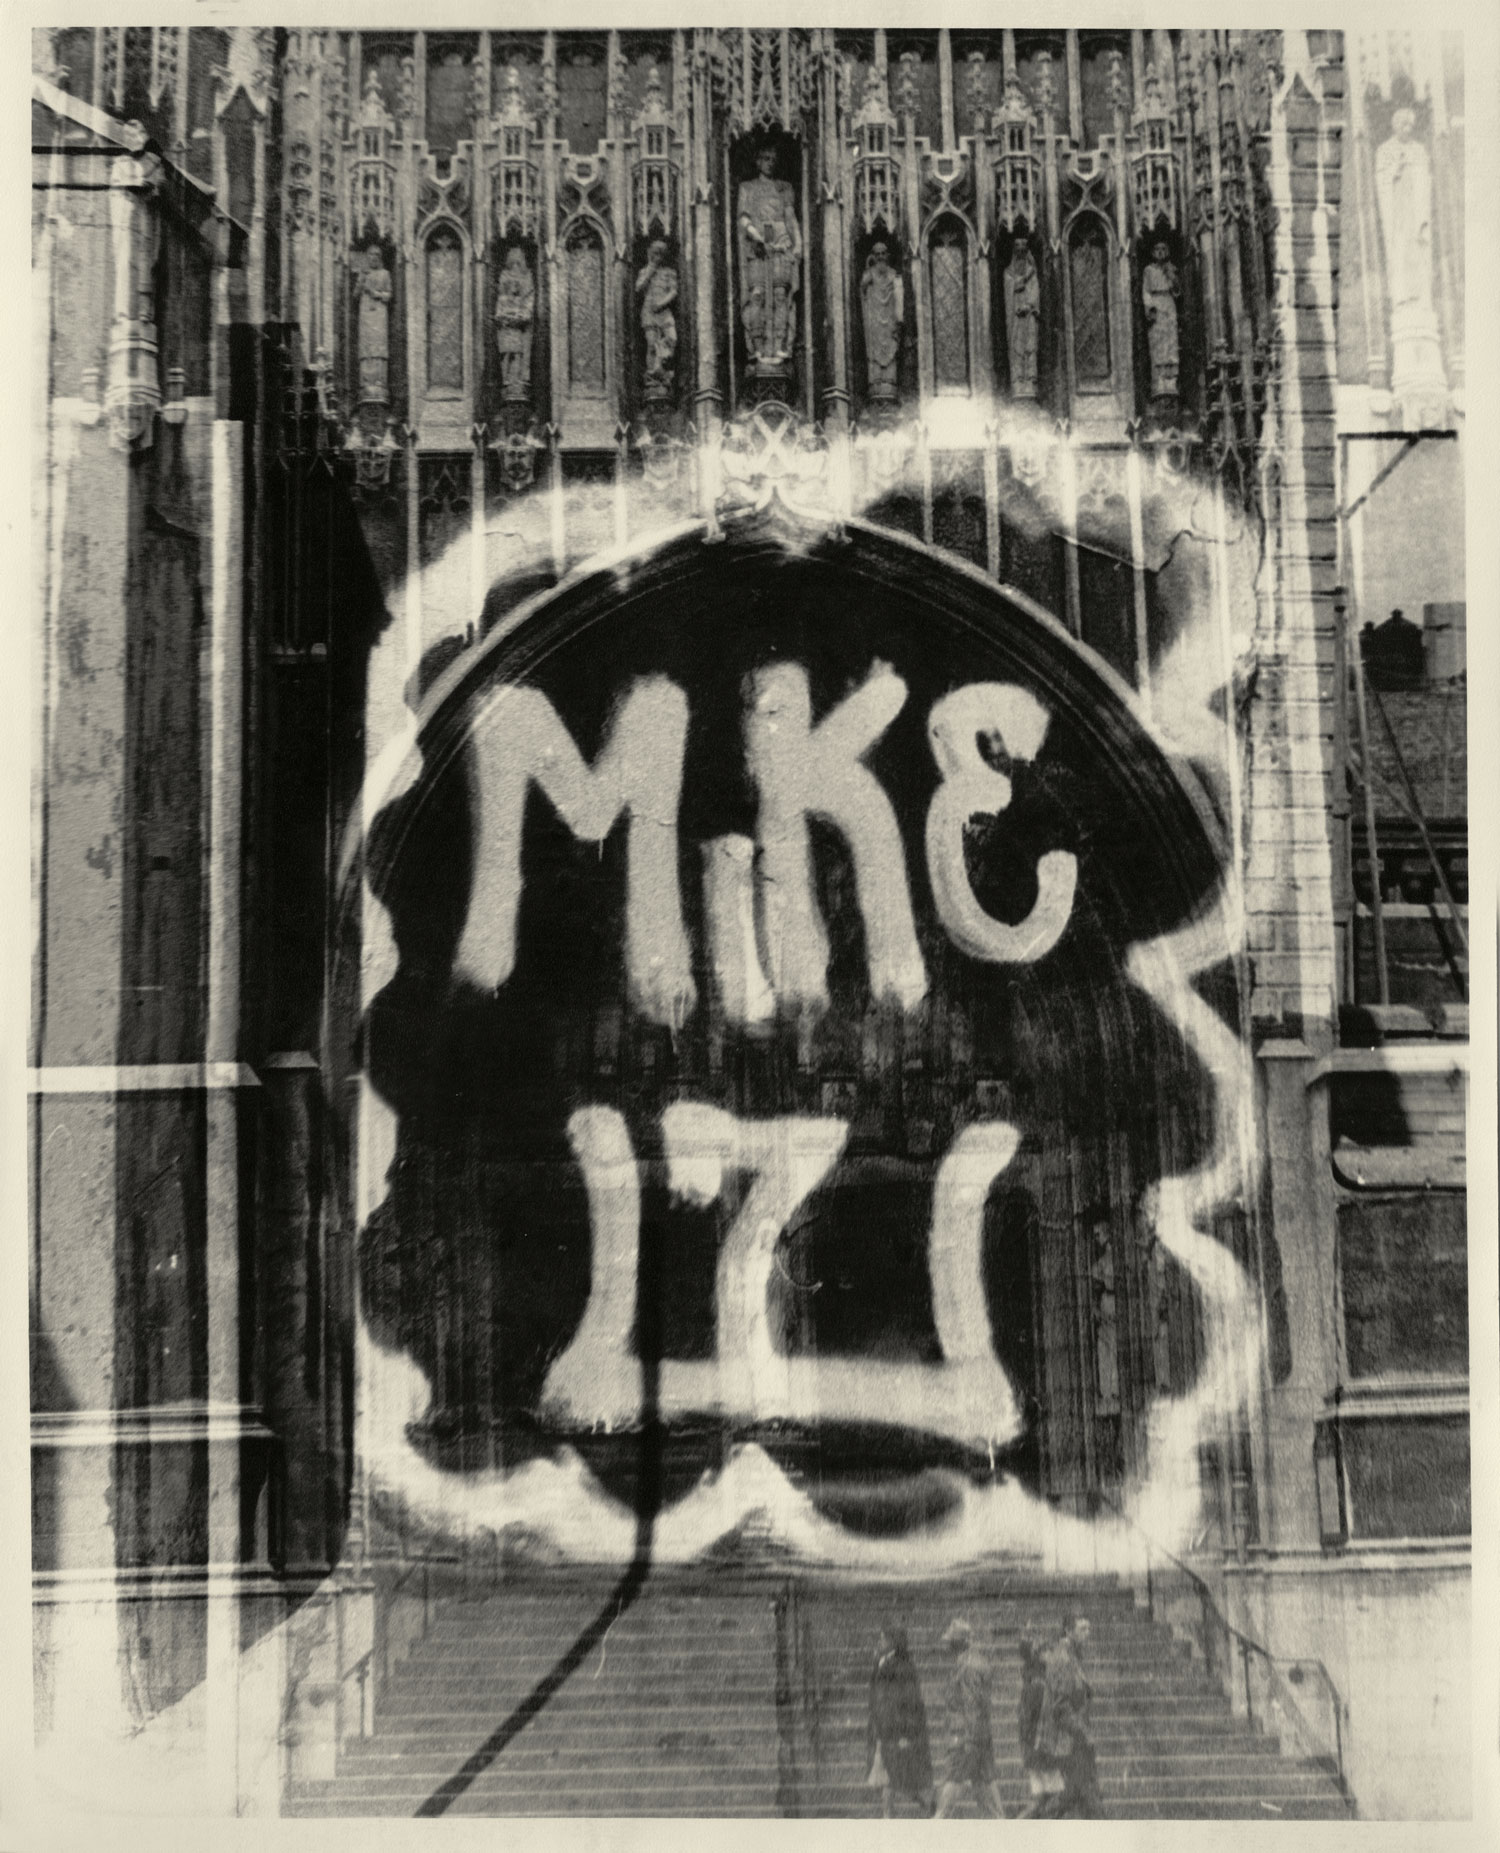 MIKE 171 double exposure, circa 1971.